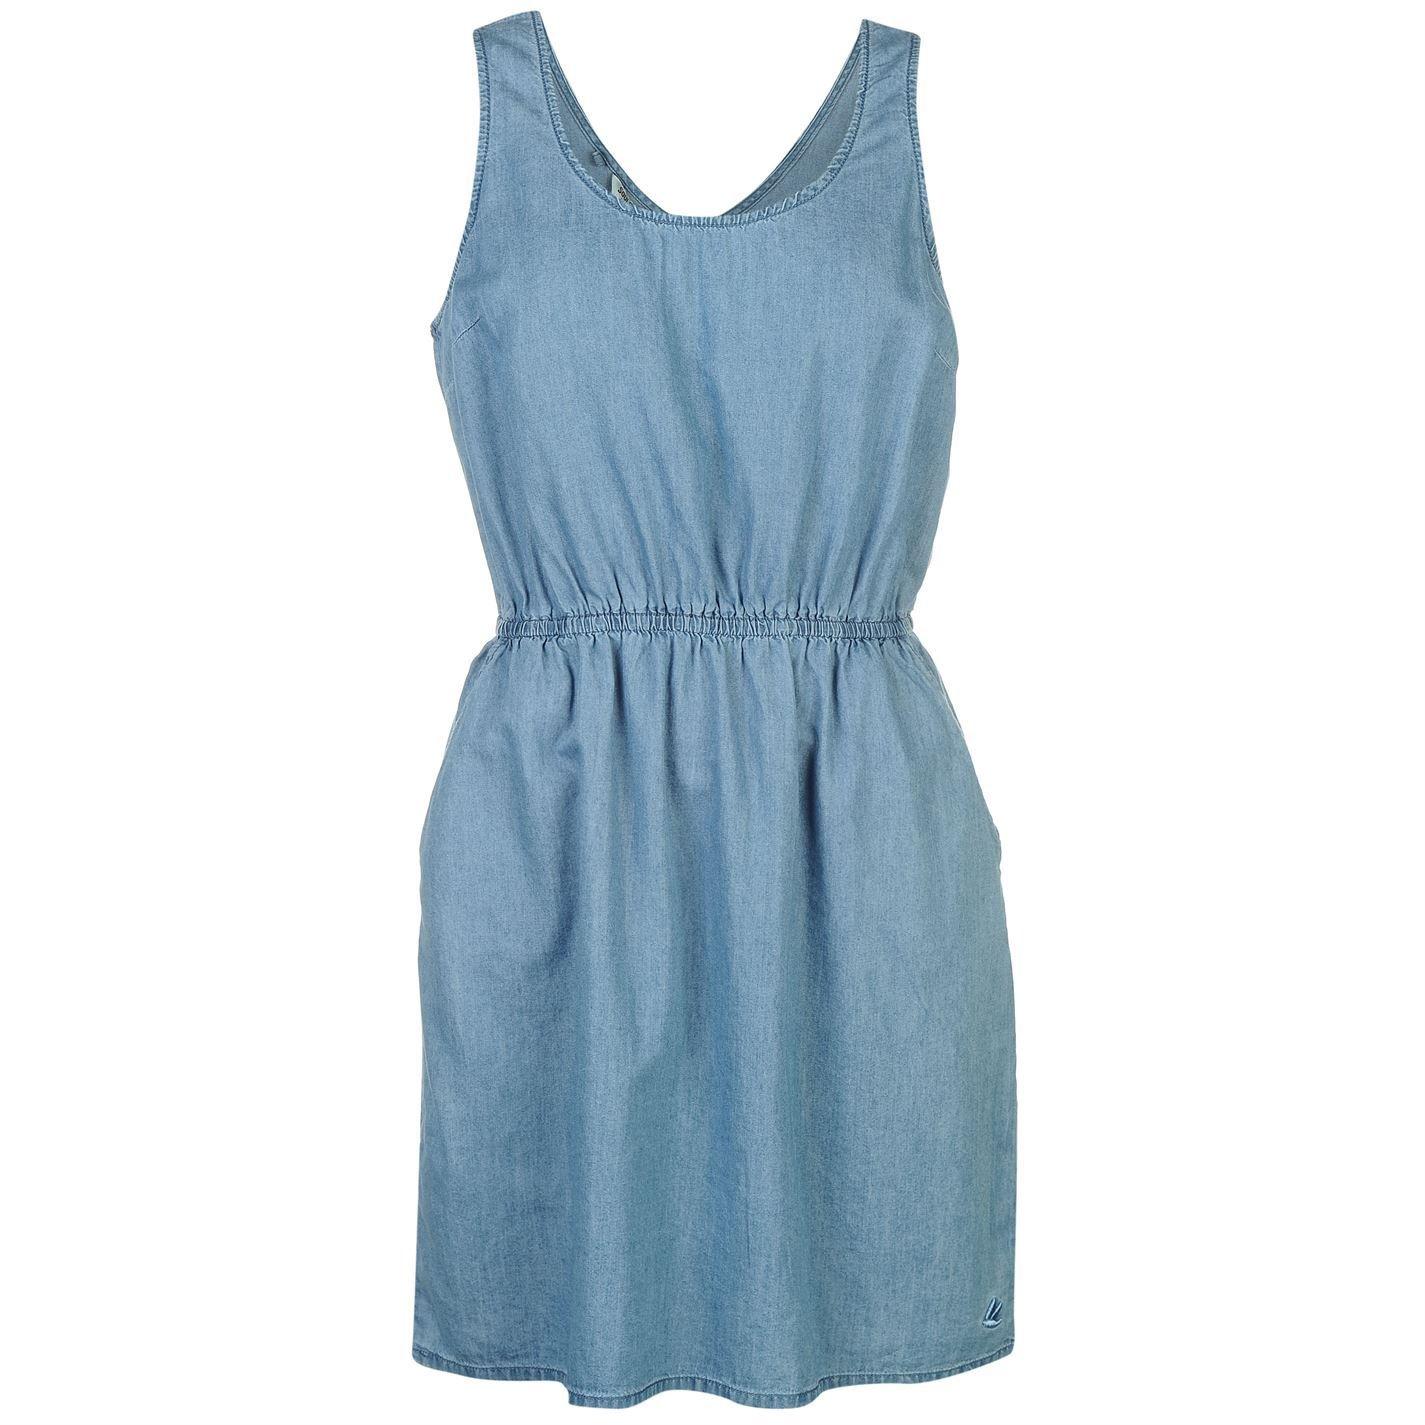 Soul Cal Mujer Denim Vestido Pichi Vaquero Mid Blue S (Eu 38/Uk 10 ...